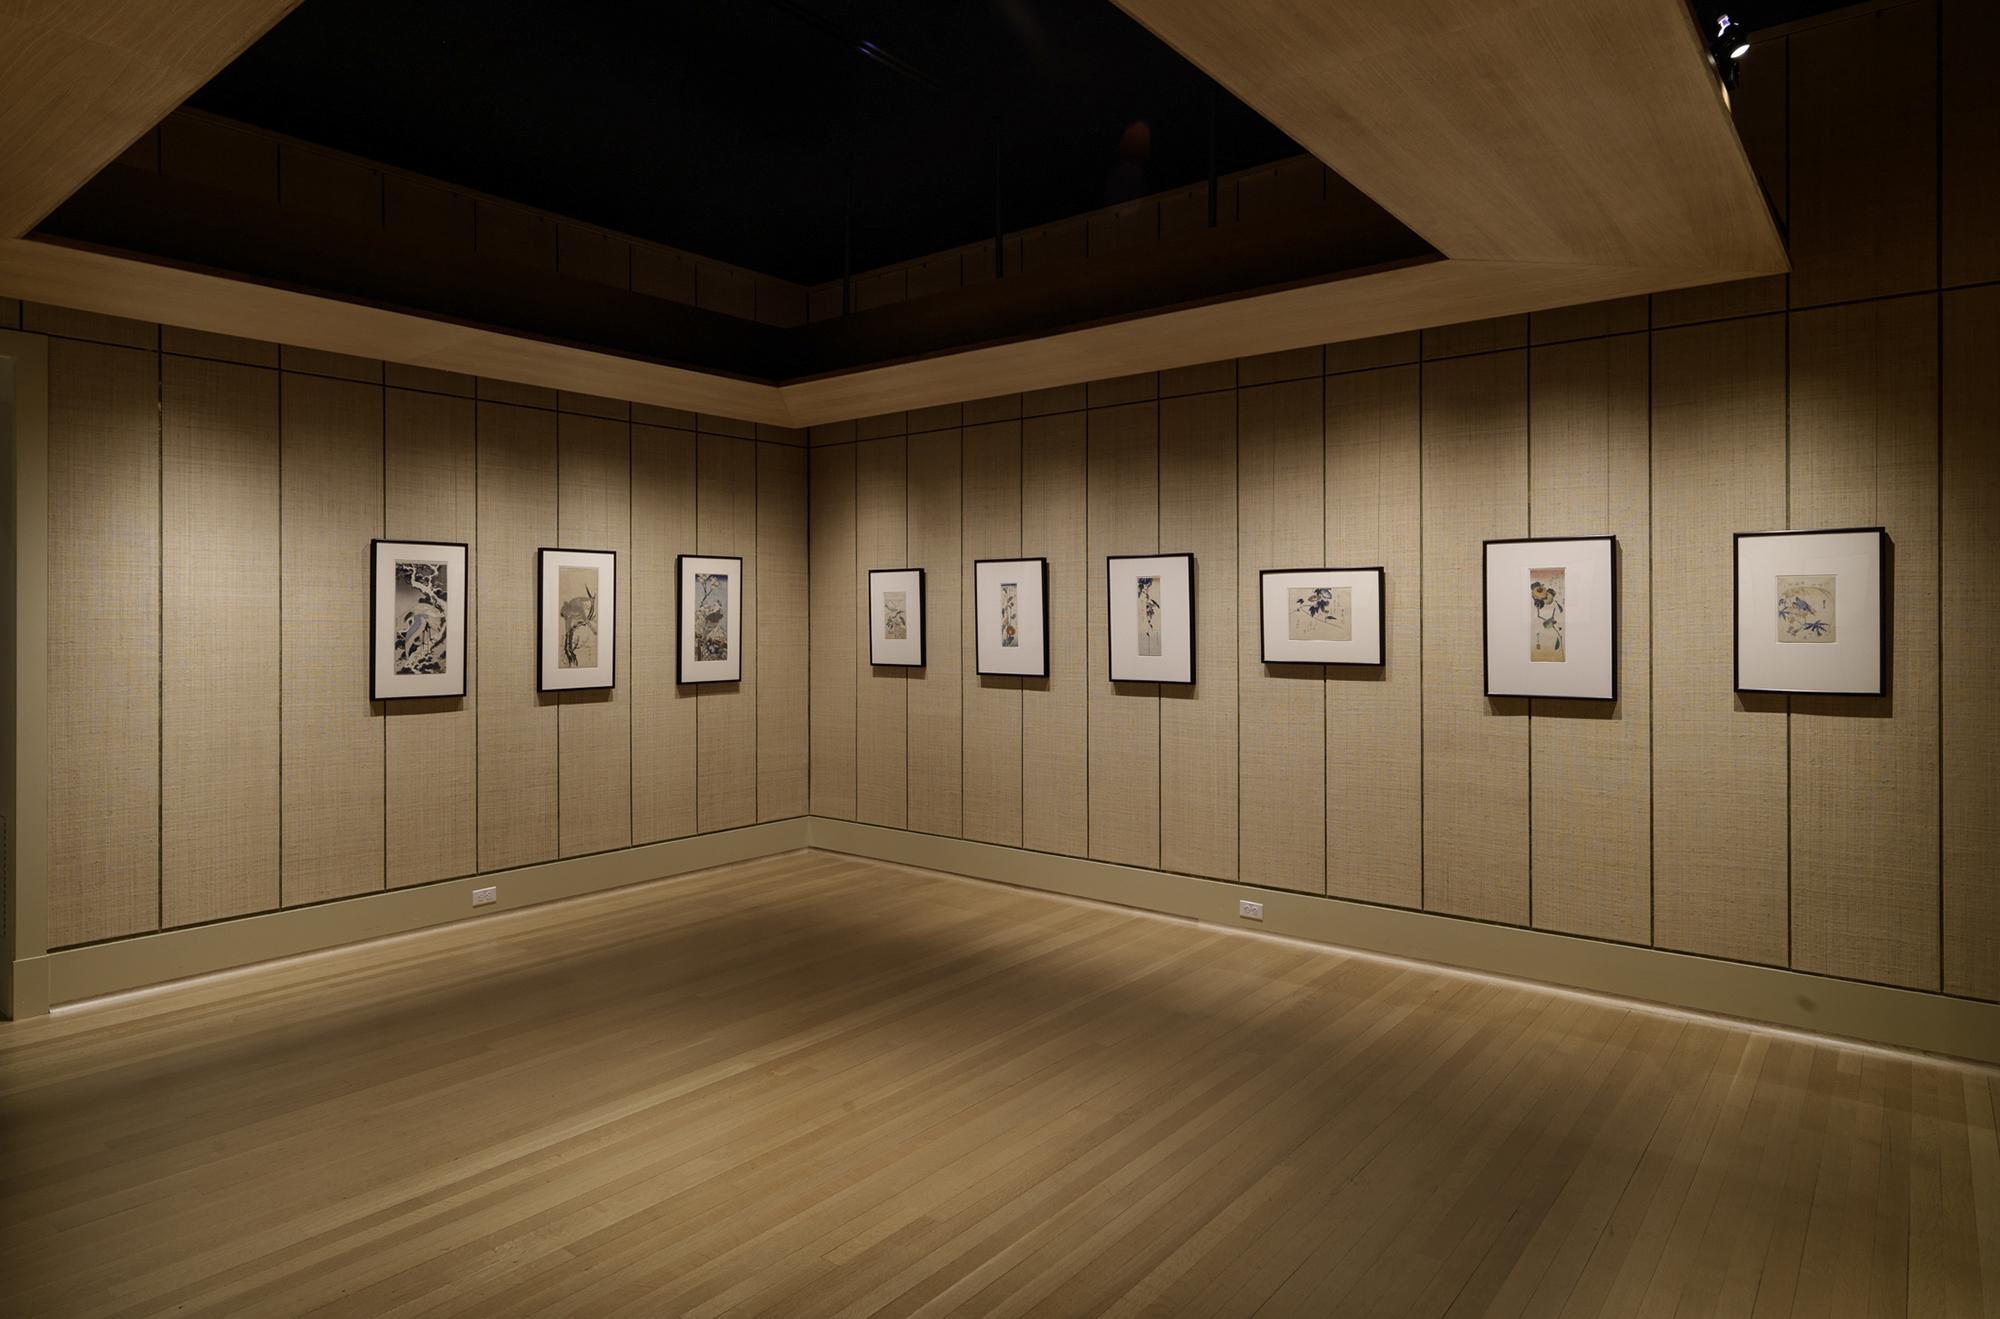 RISD Museum 6th Floor - 5.jpg